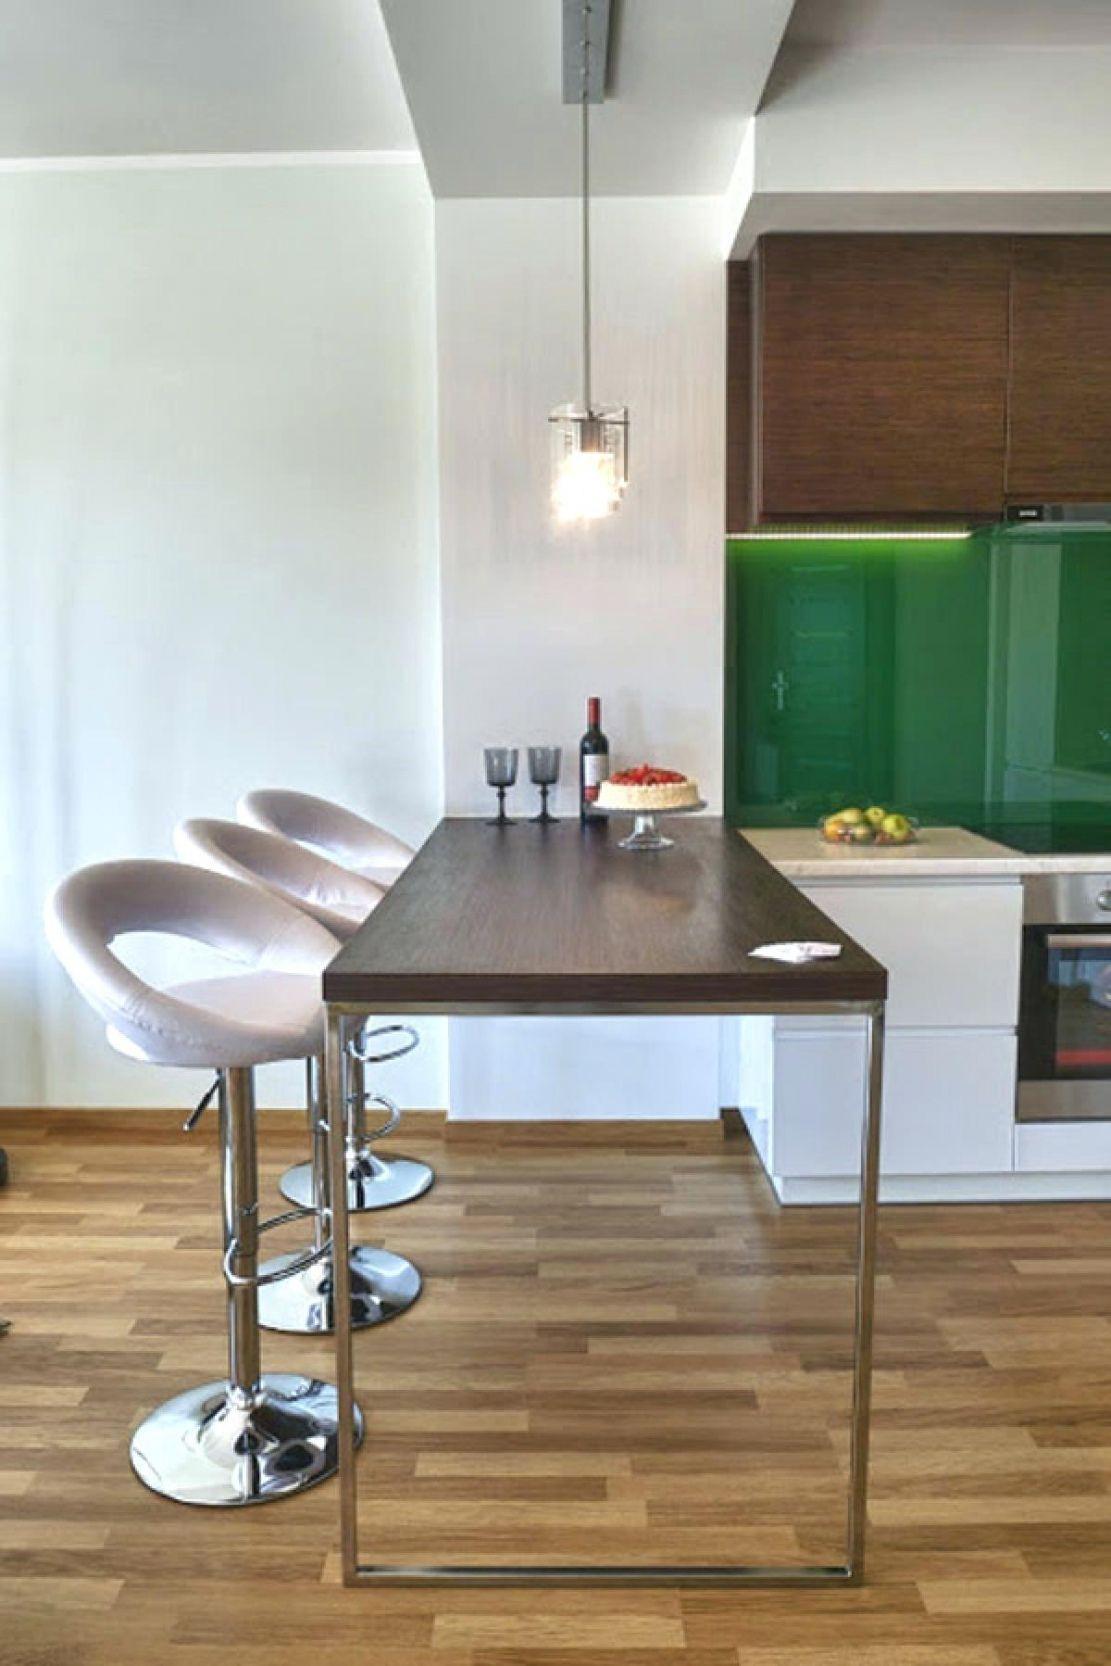 2019 Kitchen Bar Table And Stools Modern Furniture Cheap Check More At Http Evildaysoflucklessjoh Kitchen Bar